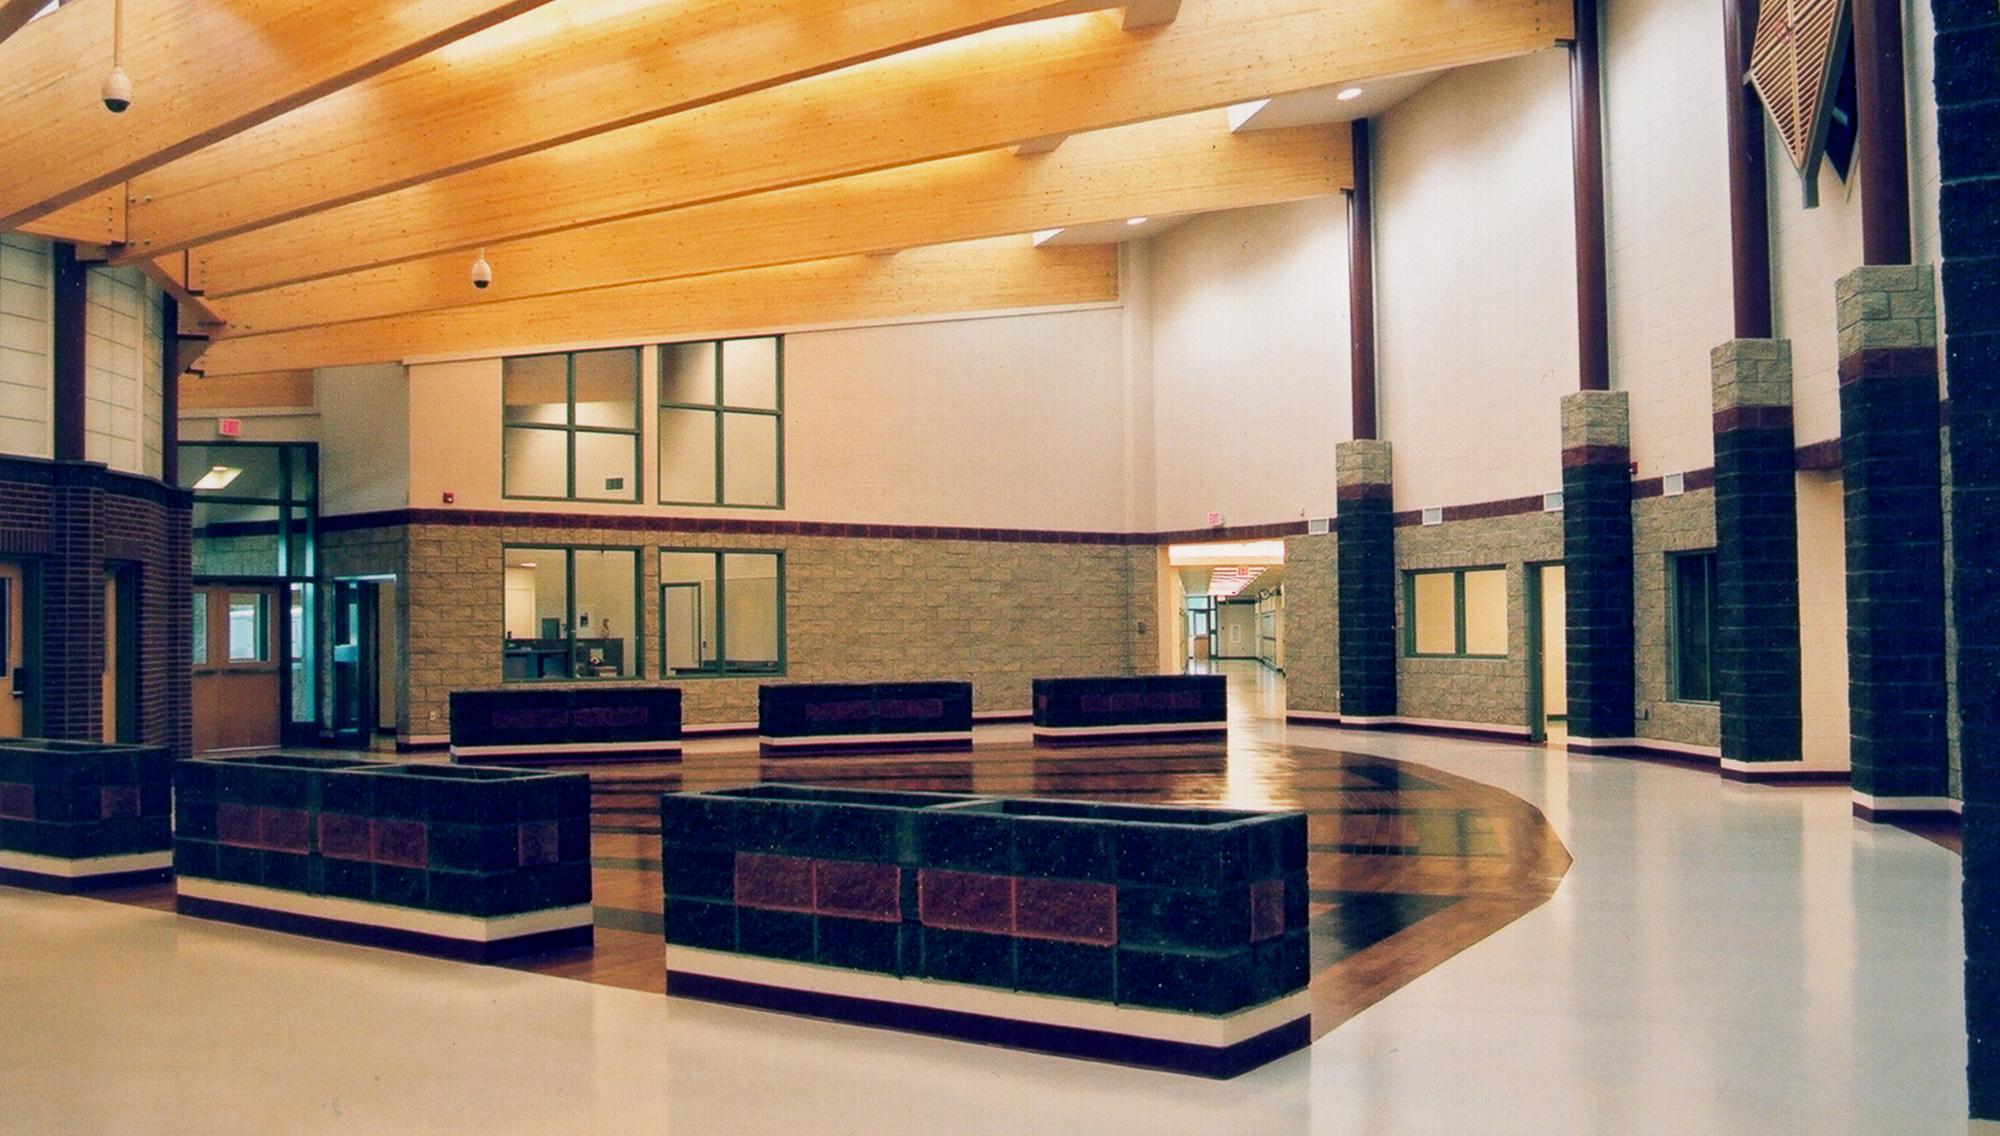 Chateh Community School interior